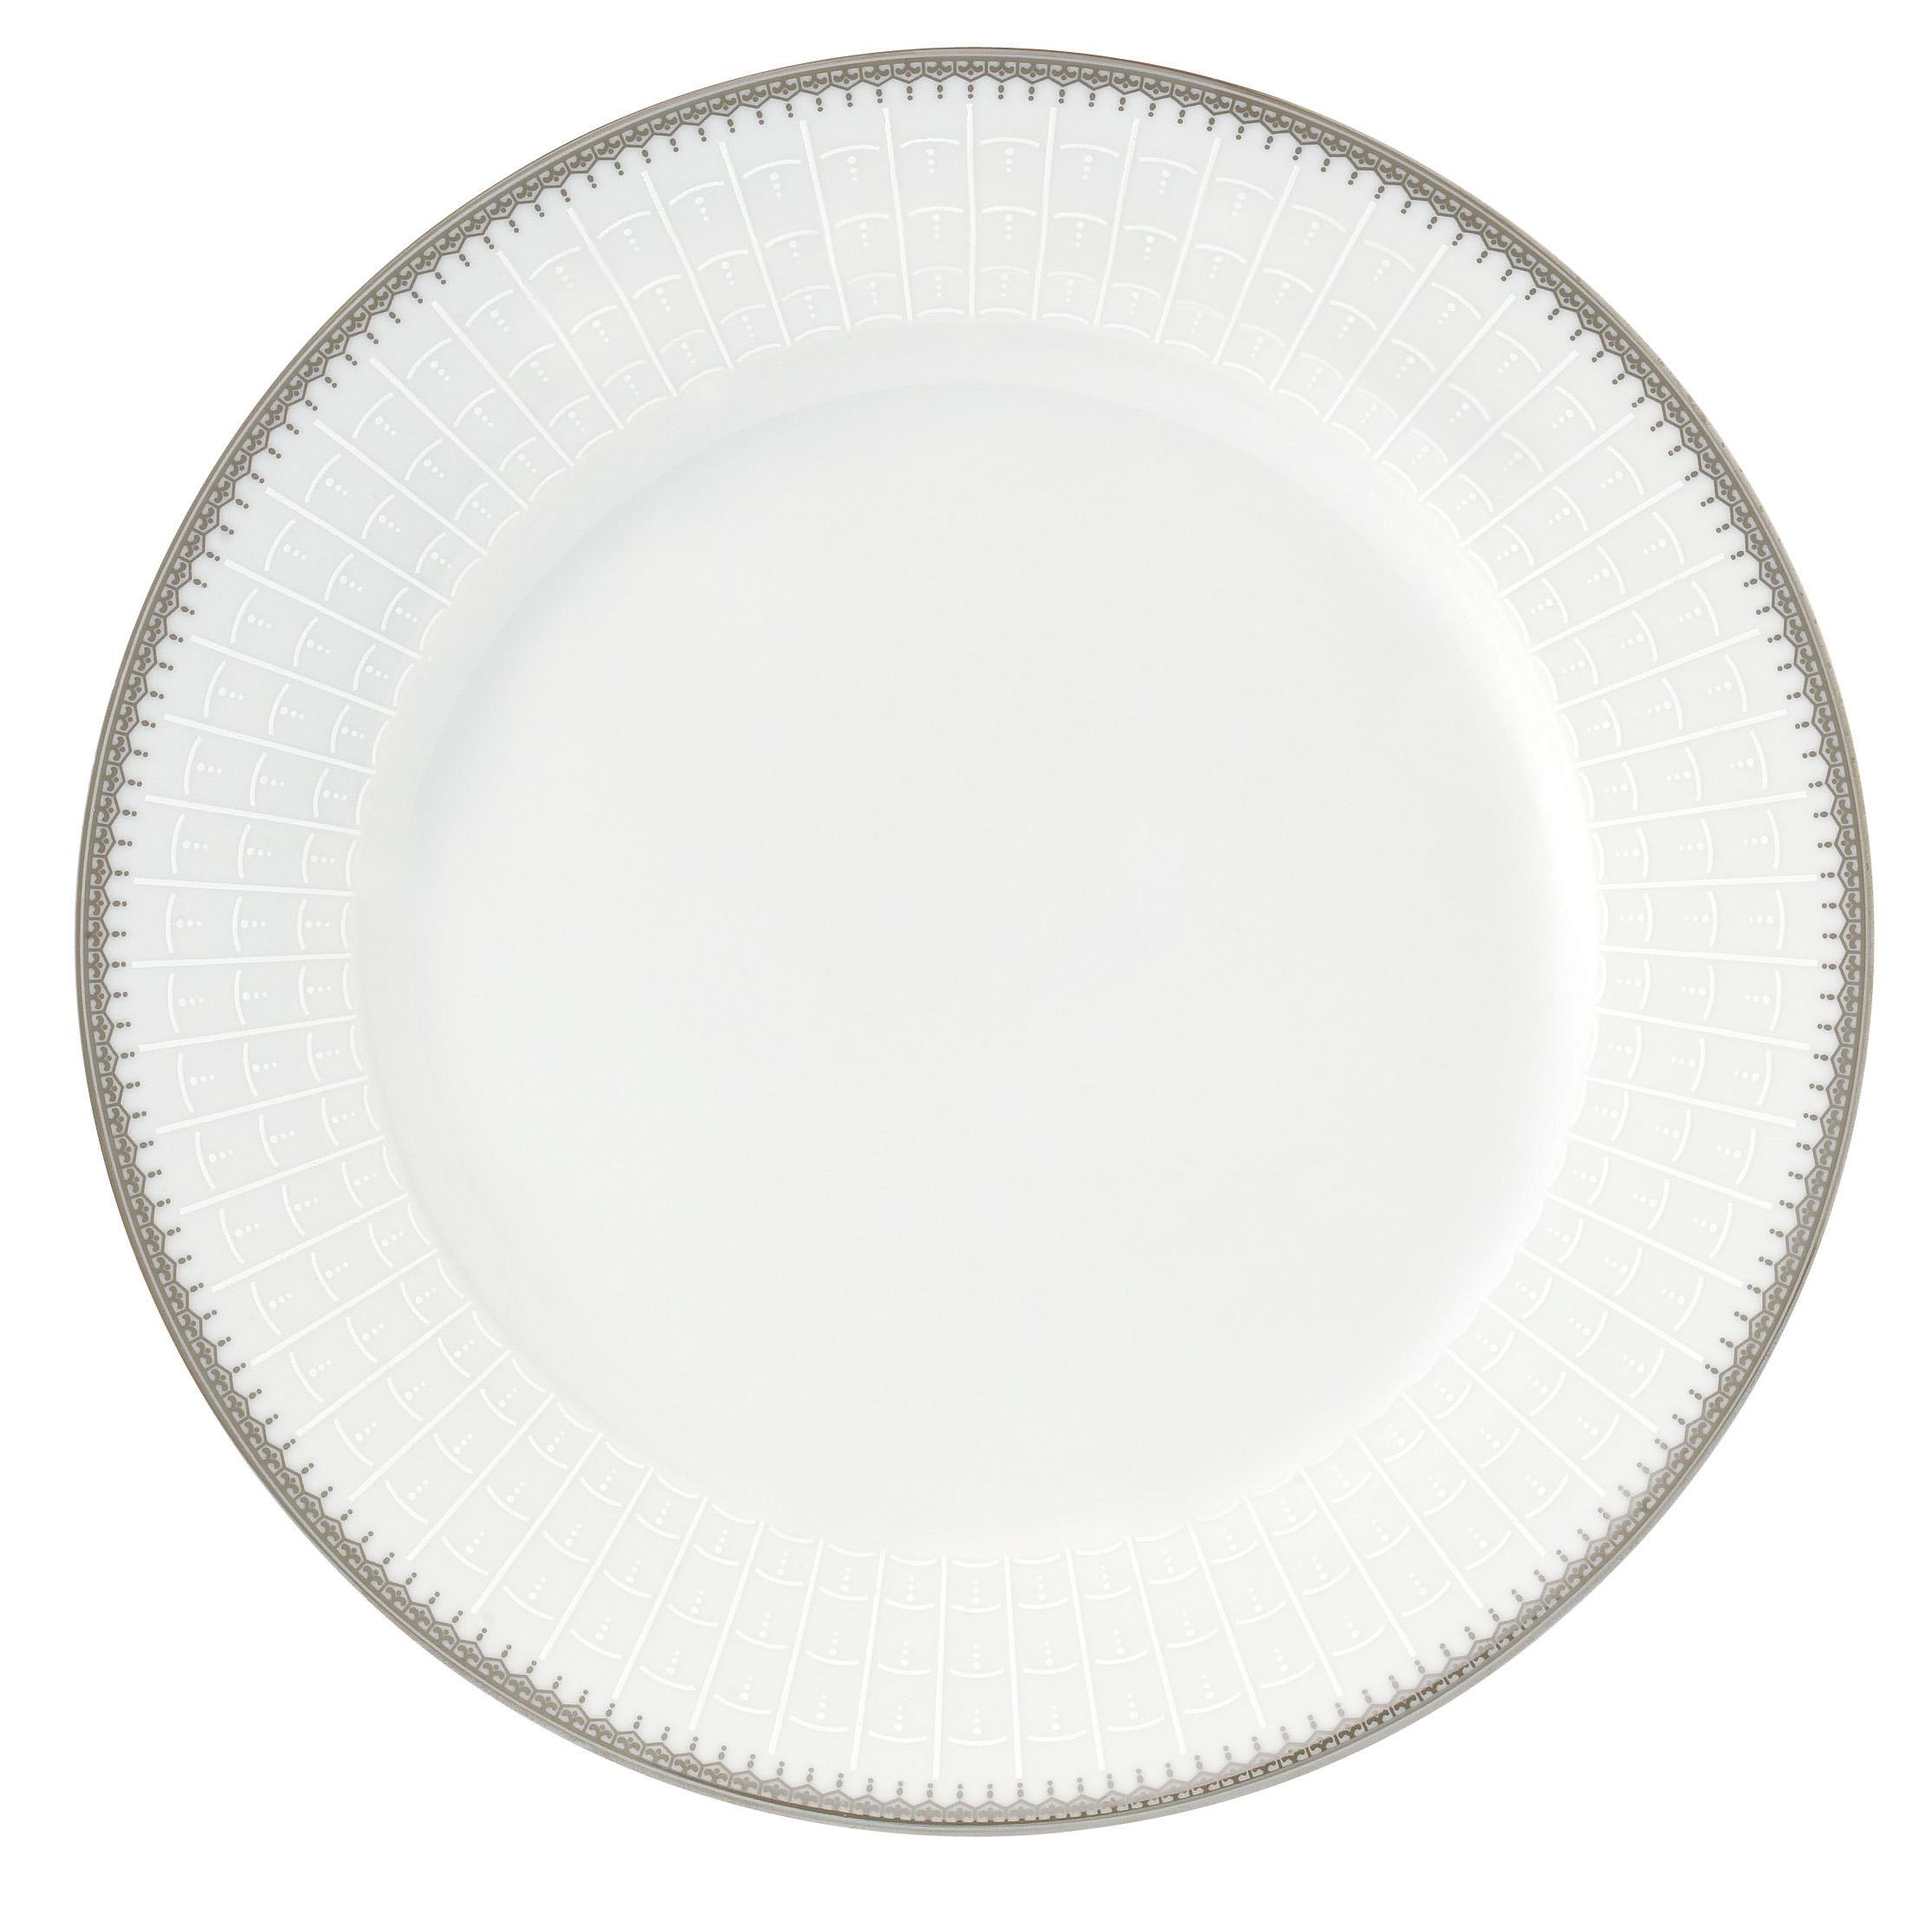 57 Piece Silver Border Porcelain Dinnerware Set Service For 8 Alyssa